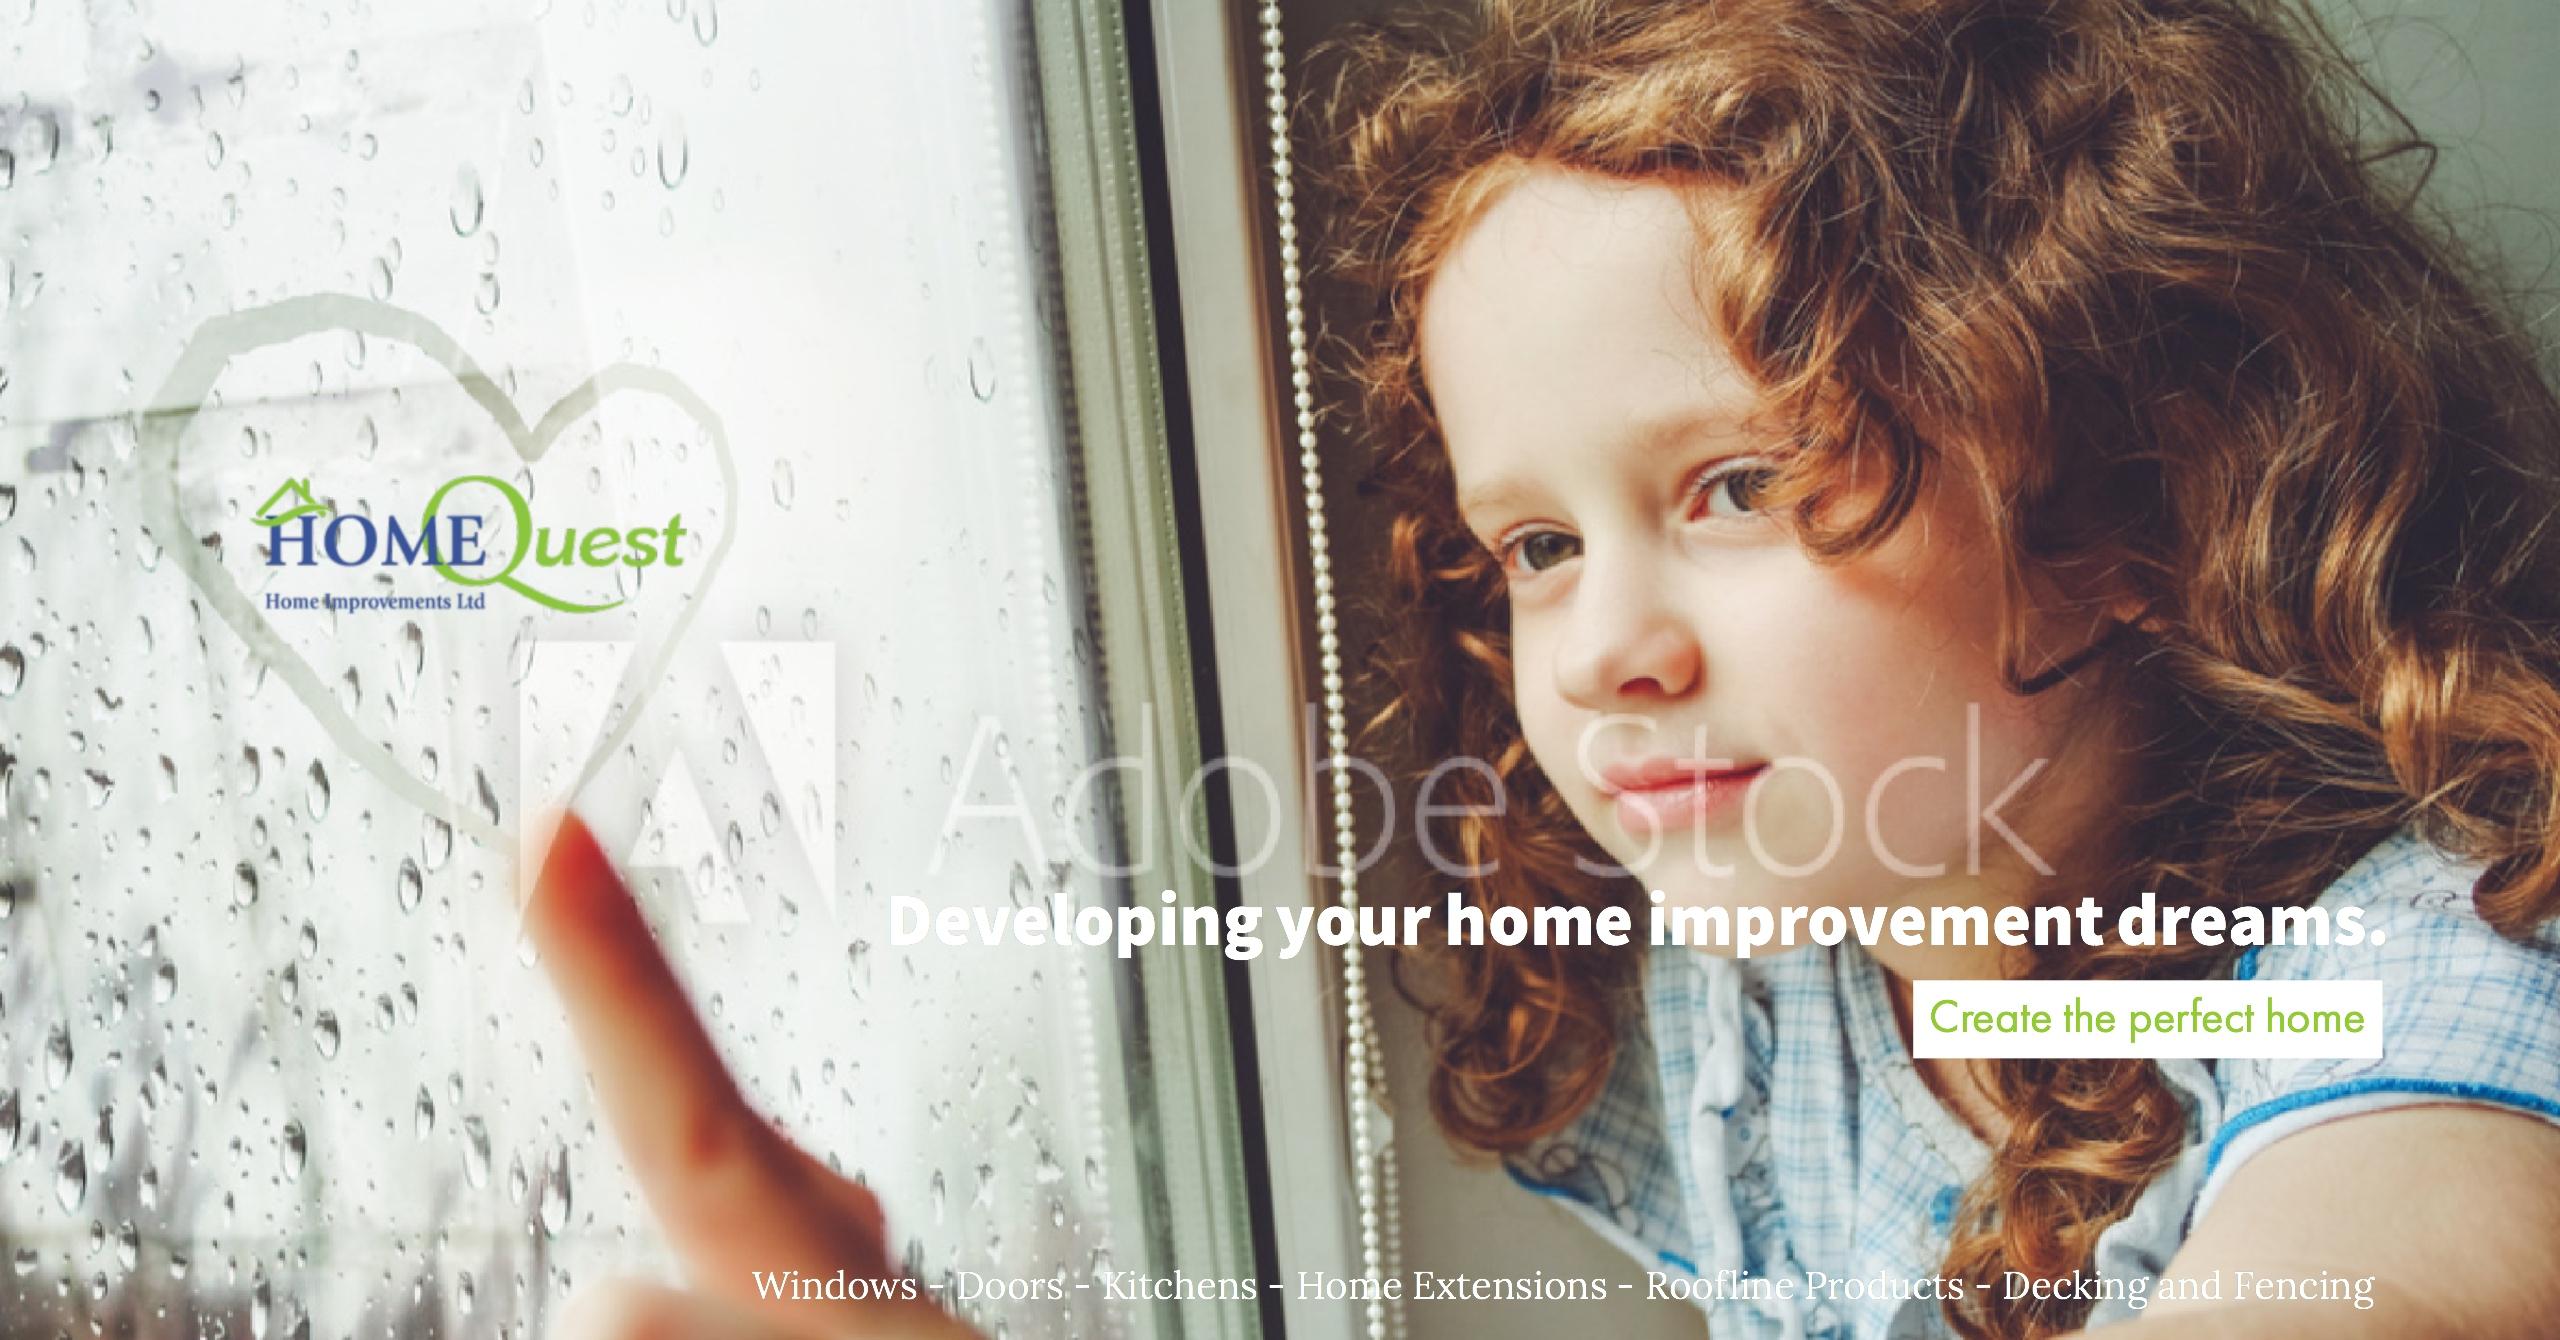 Home Quest Branding